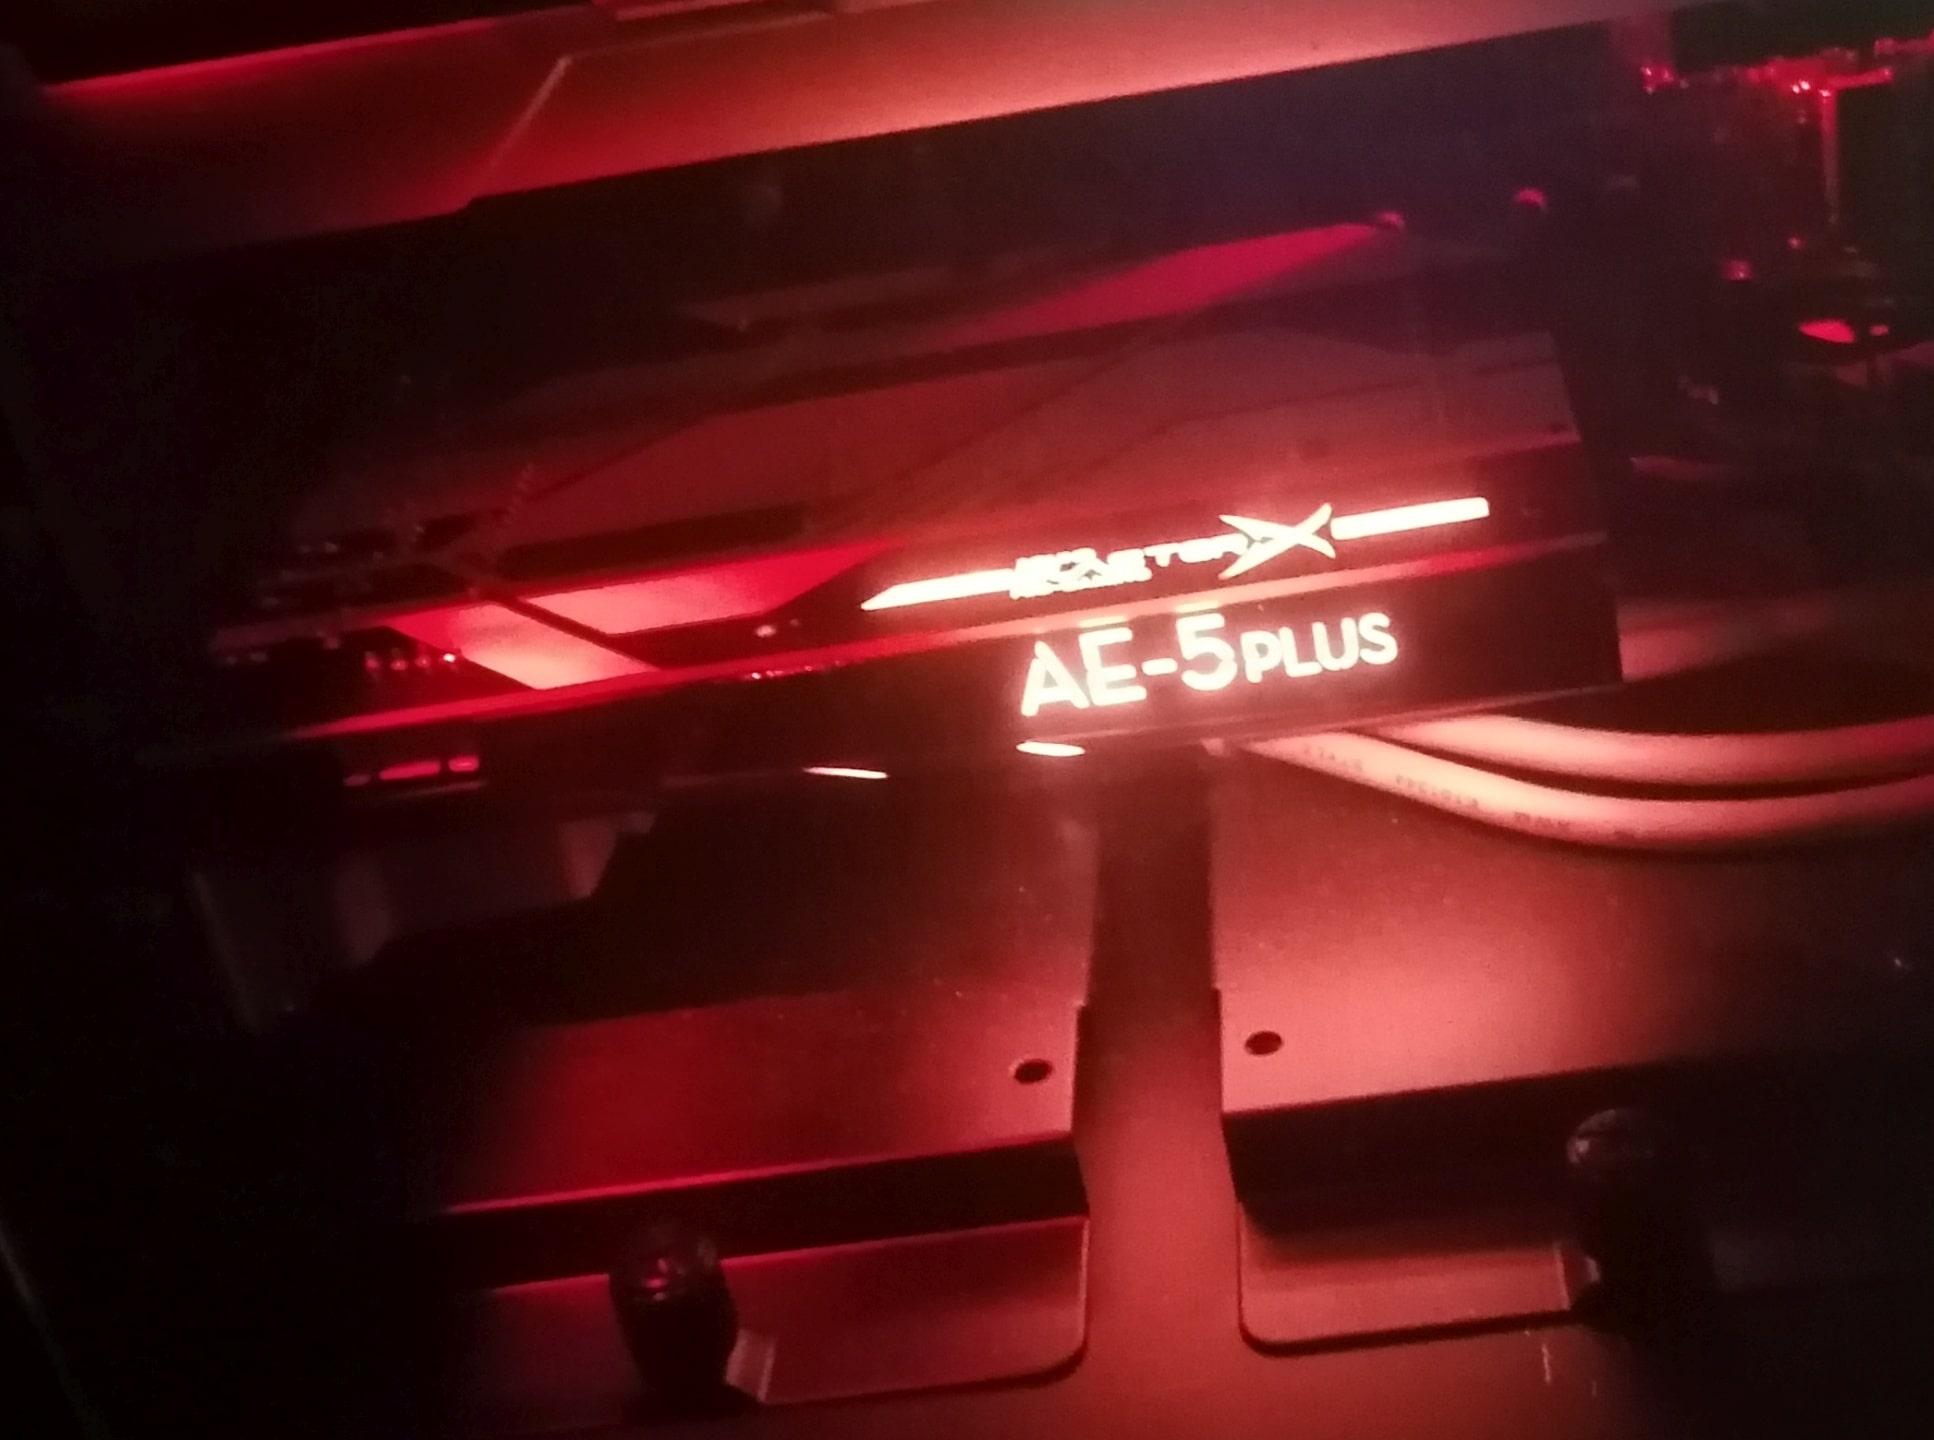 Creative Sound Blaster-X AE-5 Plus Recensione